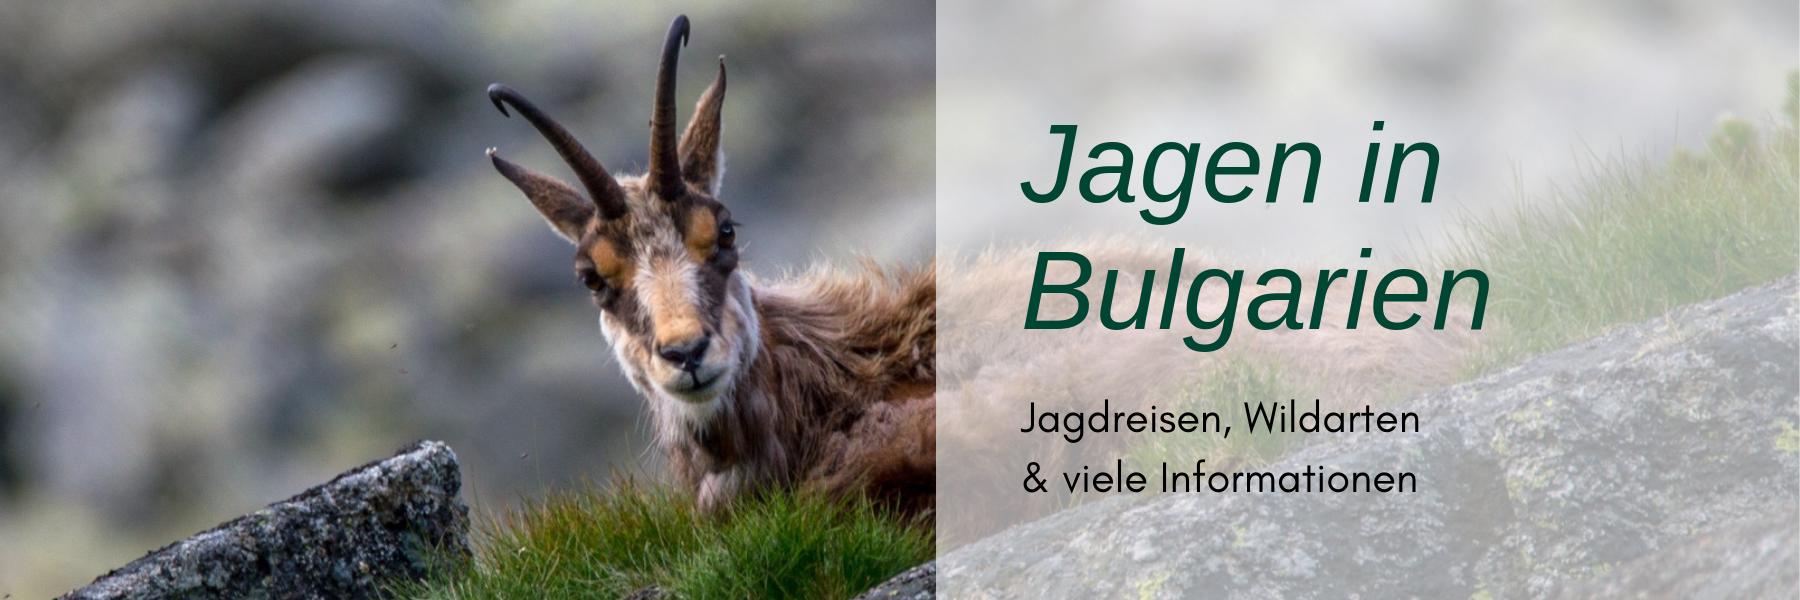 Jagdreise Bulgarien